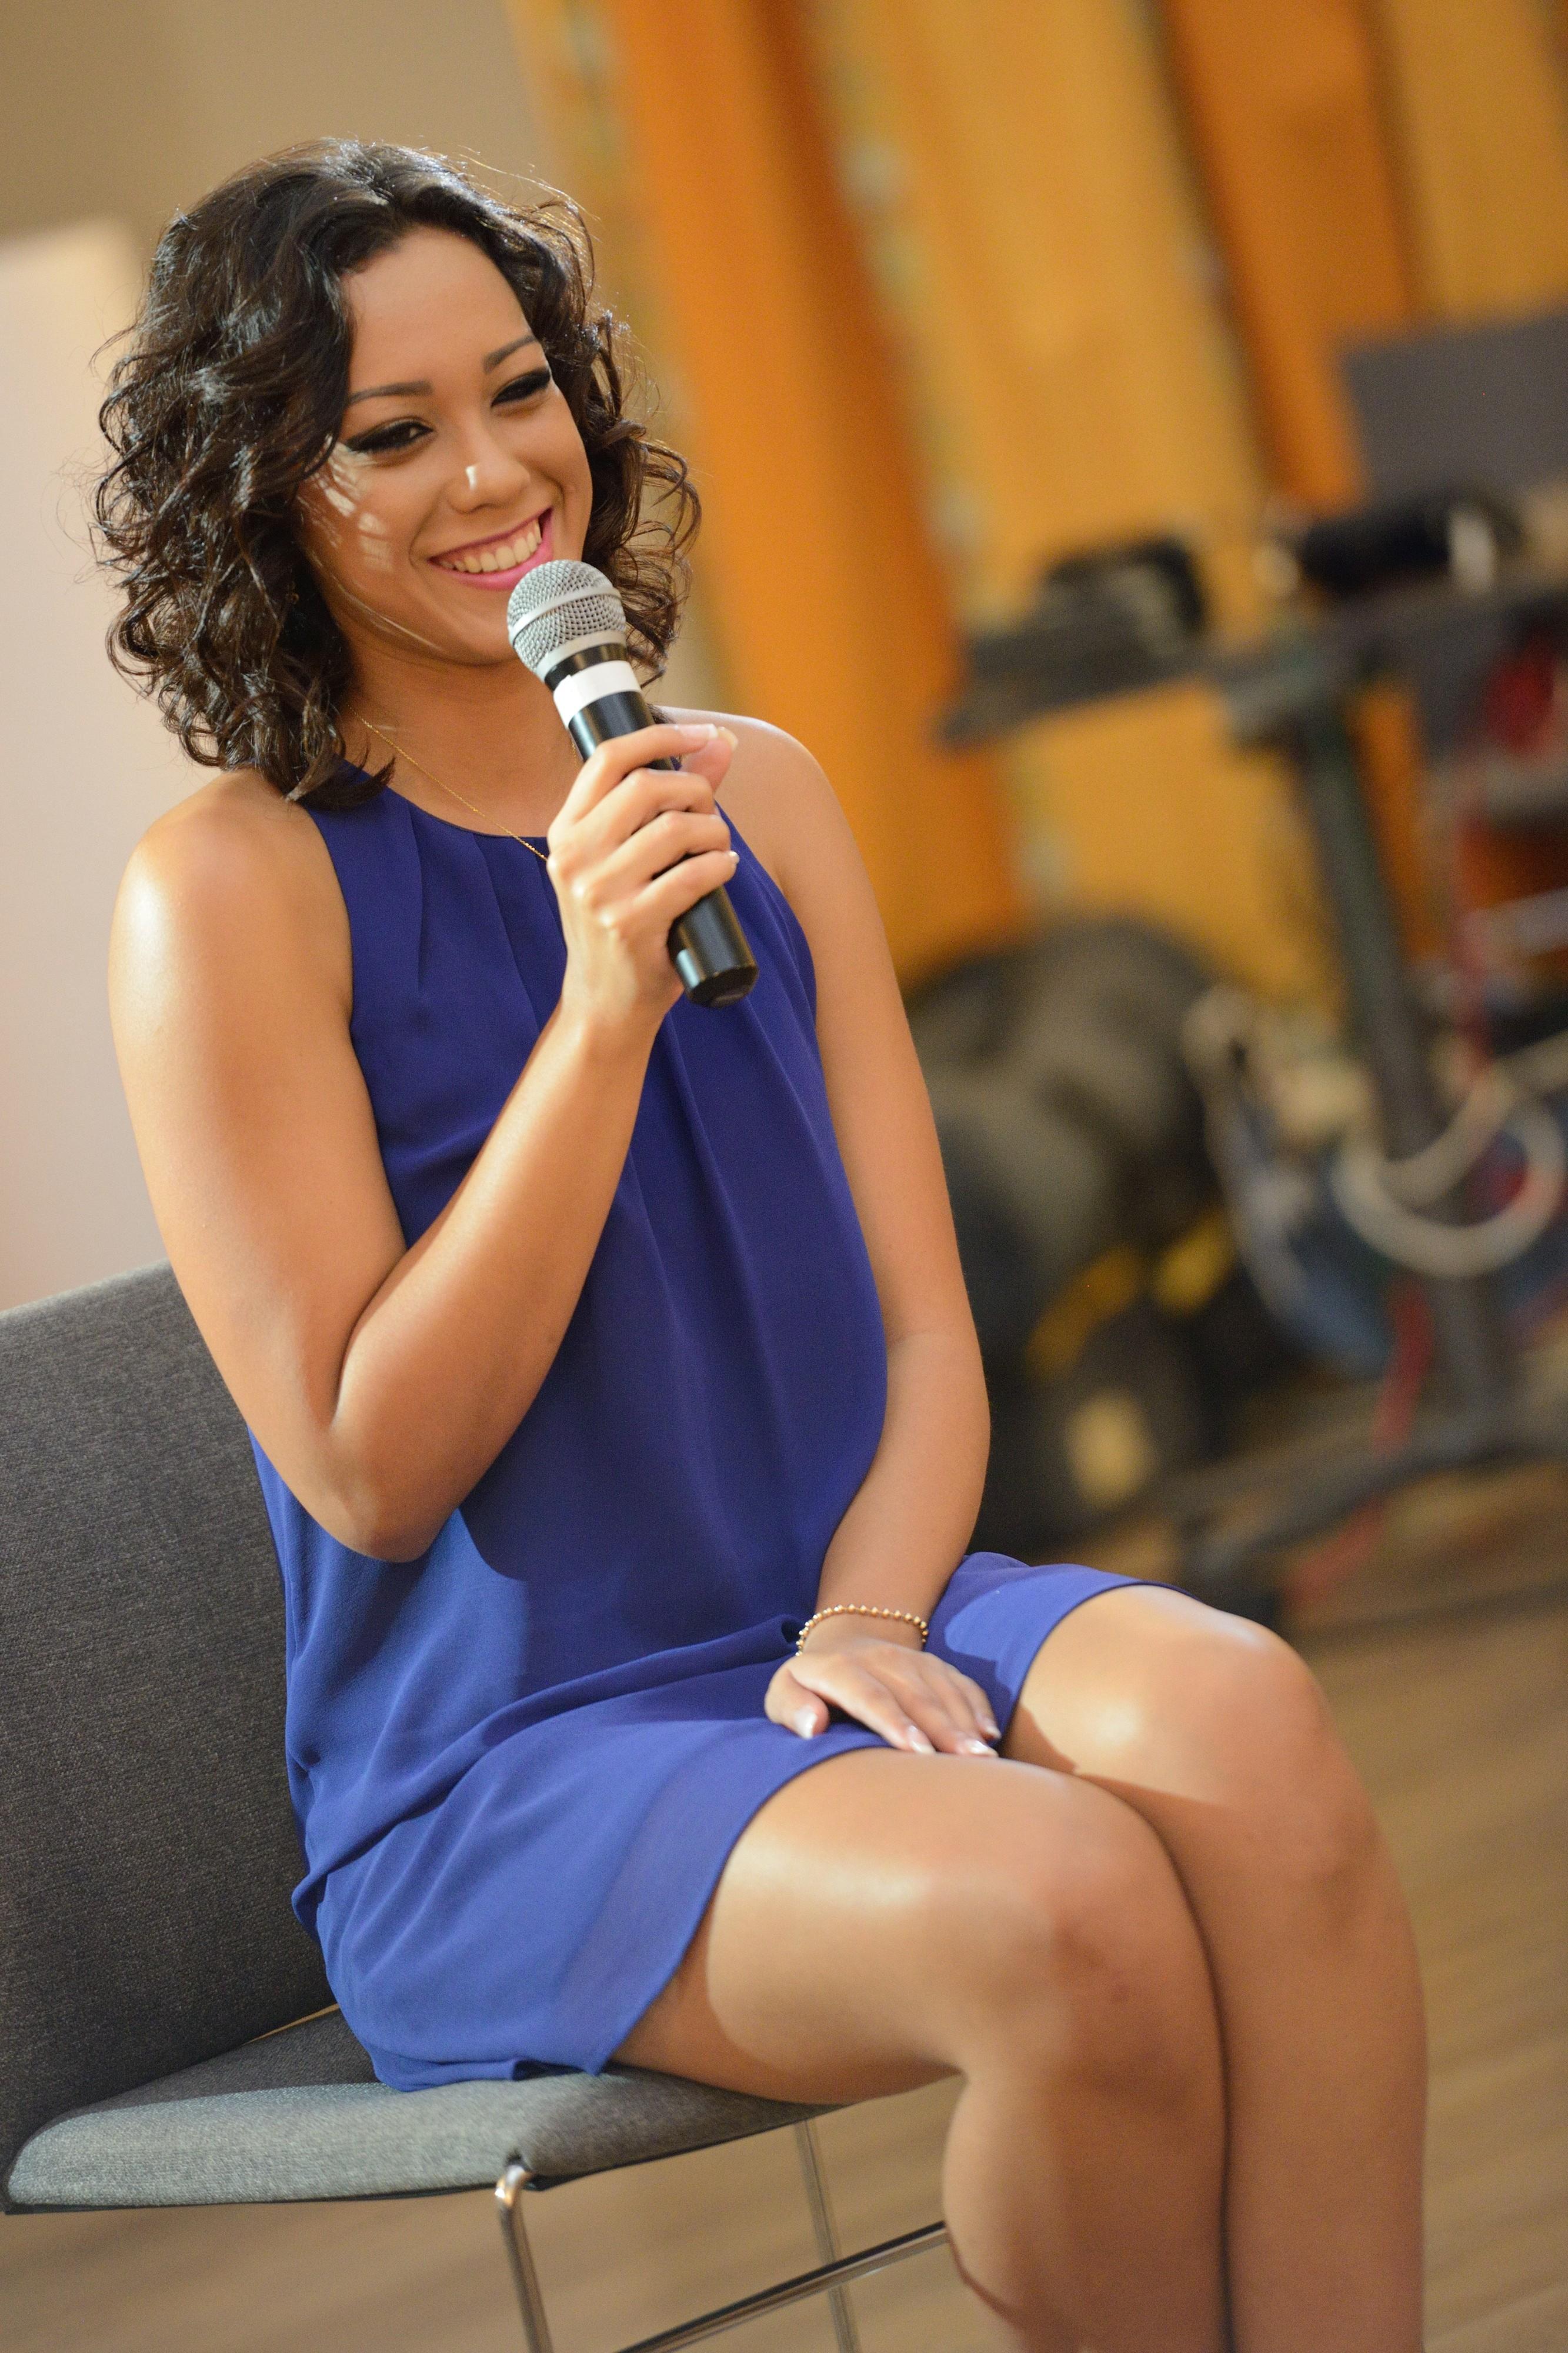 Yasmeine, robe bleue classique, efficace!